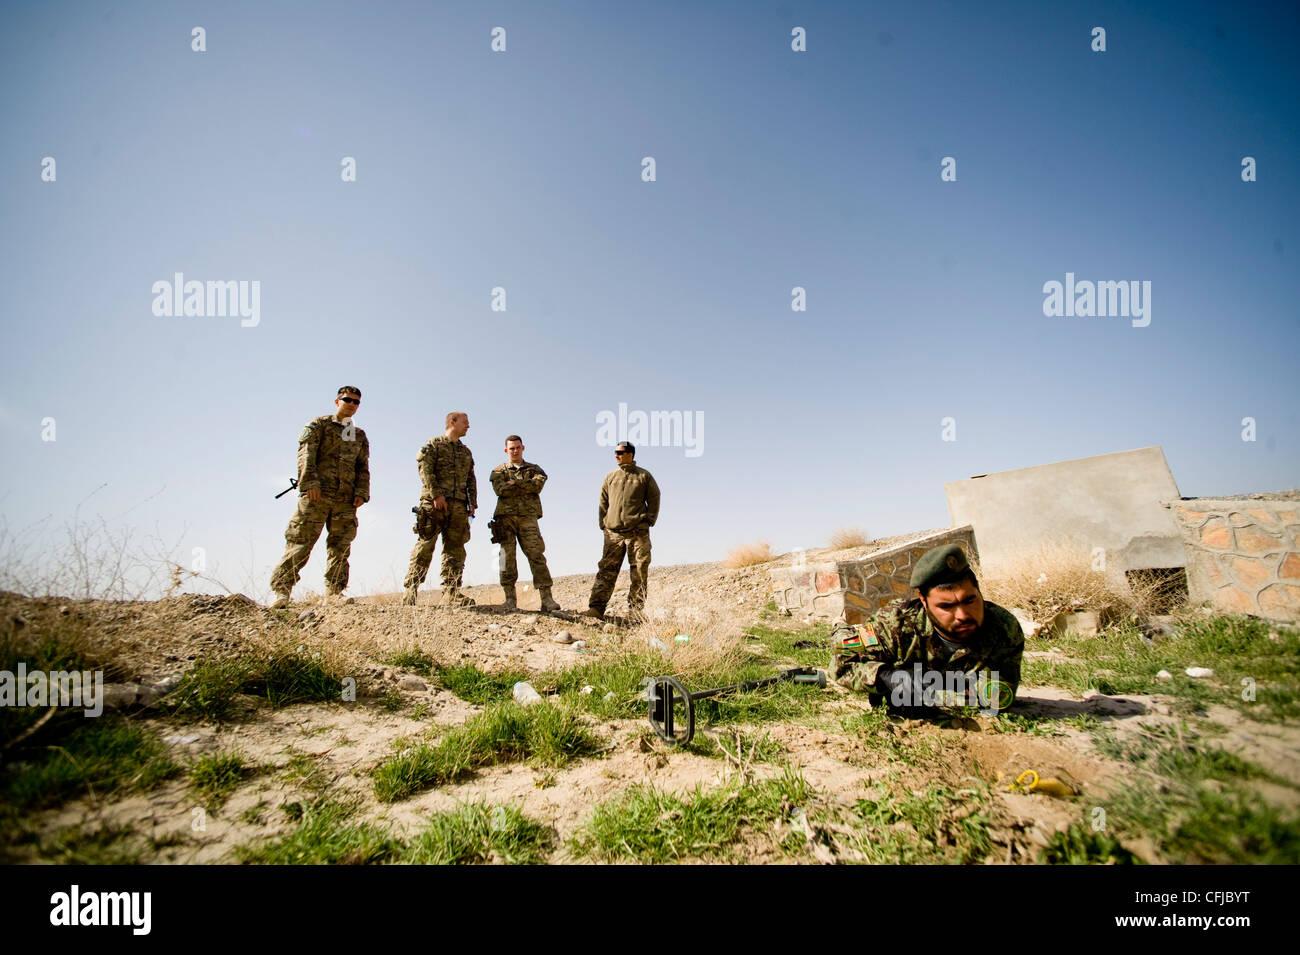 KANDAHAR, Afghanistan - Fakhr Uddin, an Afghan National Army soldier, trains while Explosive Ordnance Disposal Airmen - Stock Image